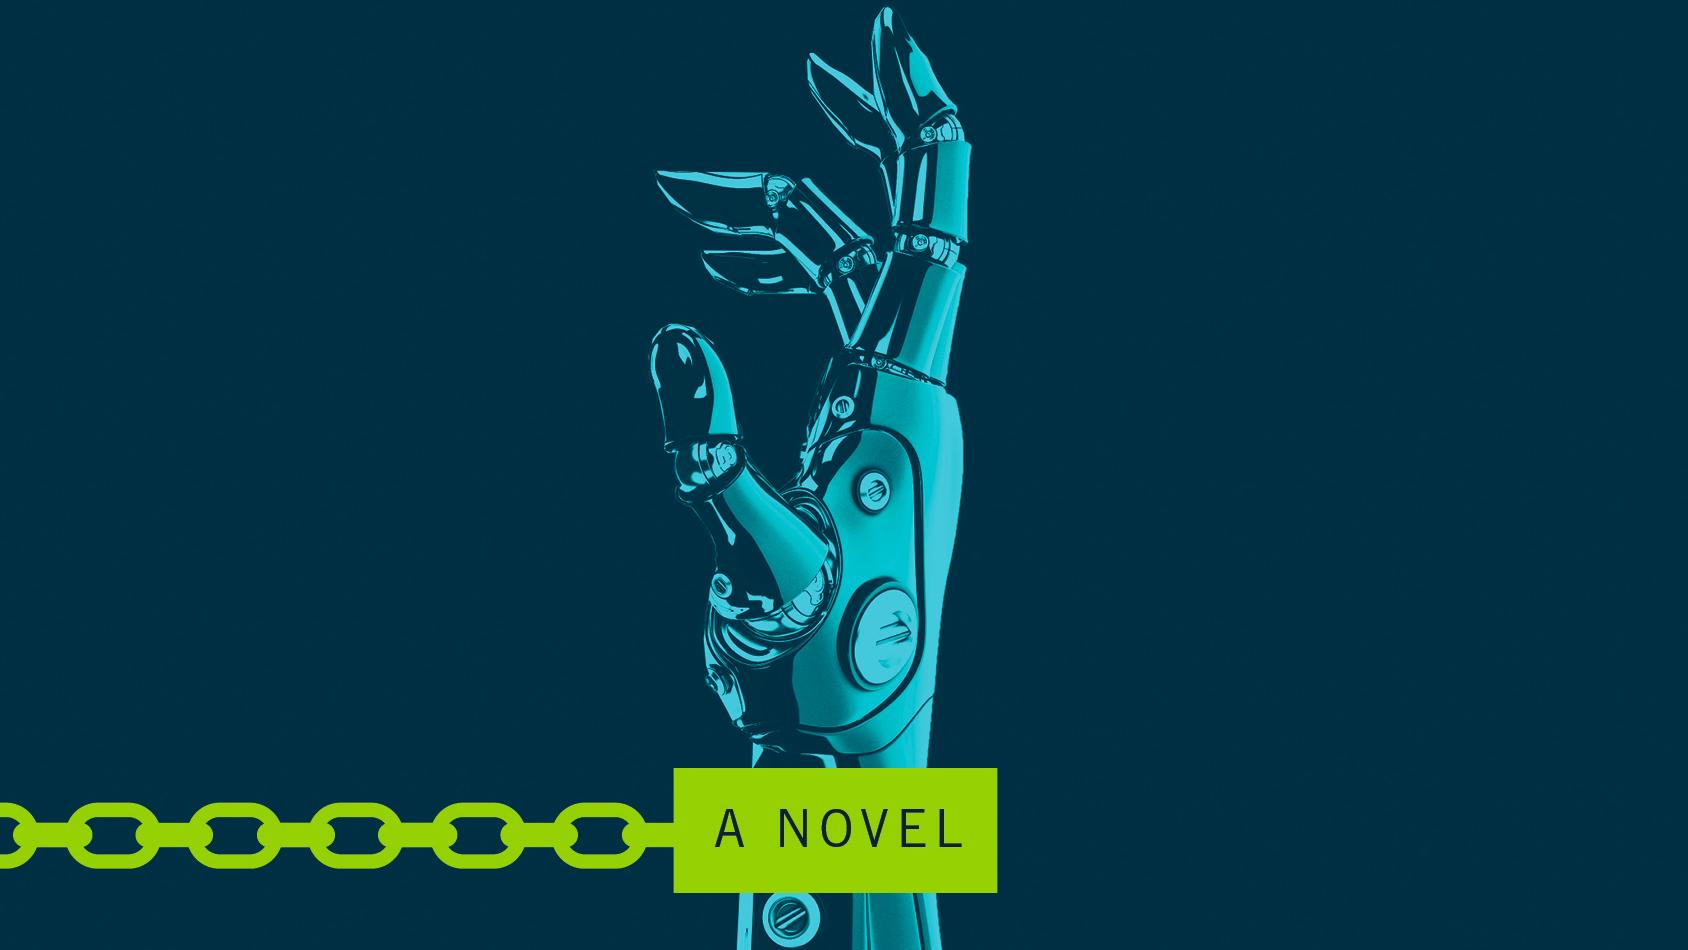 An Exclusive Excerpt From Annalee Newitz's New Novel, Autonomous